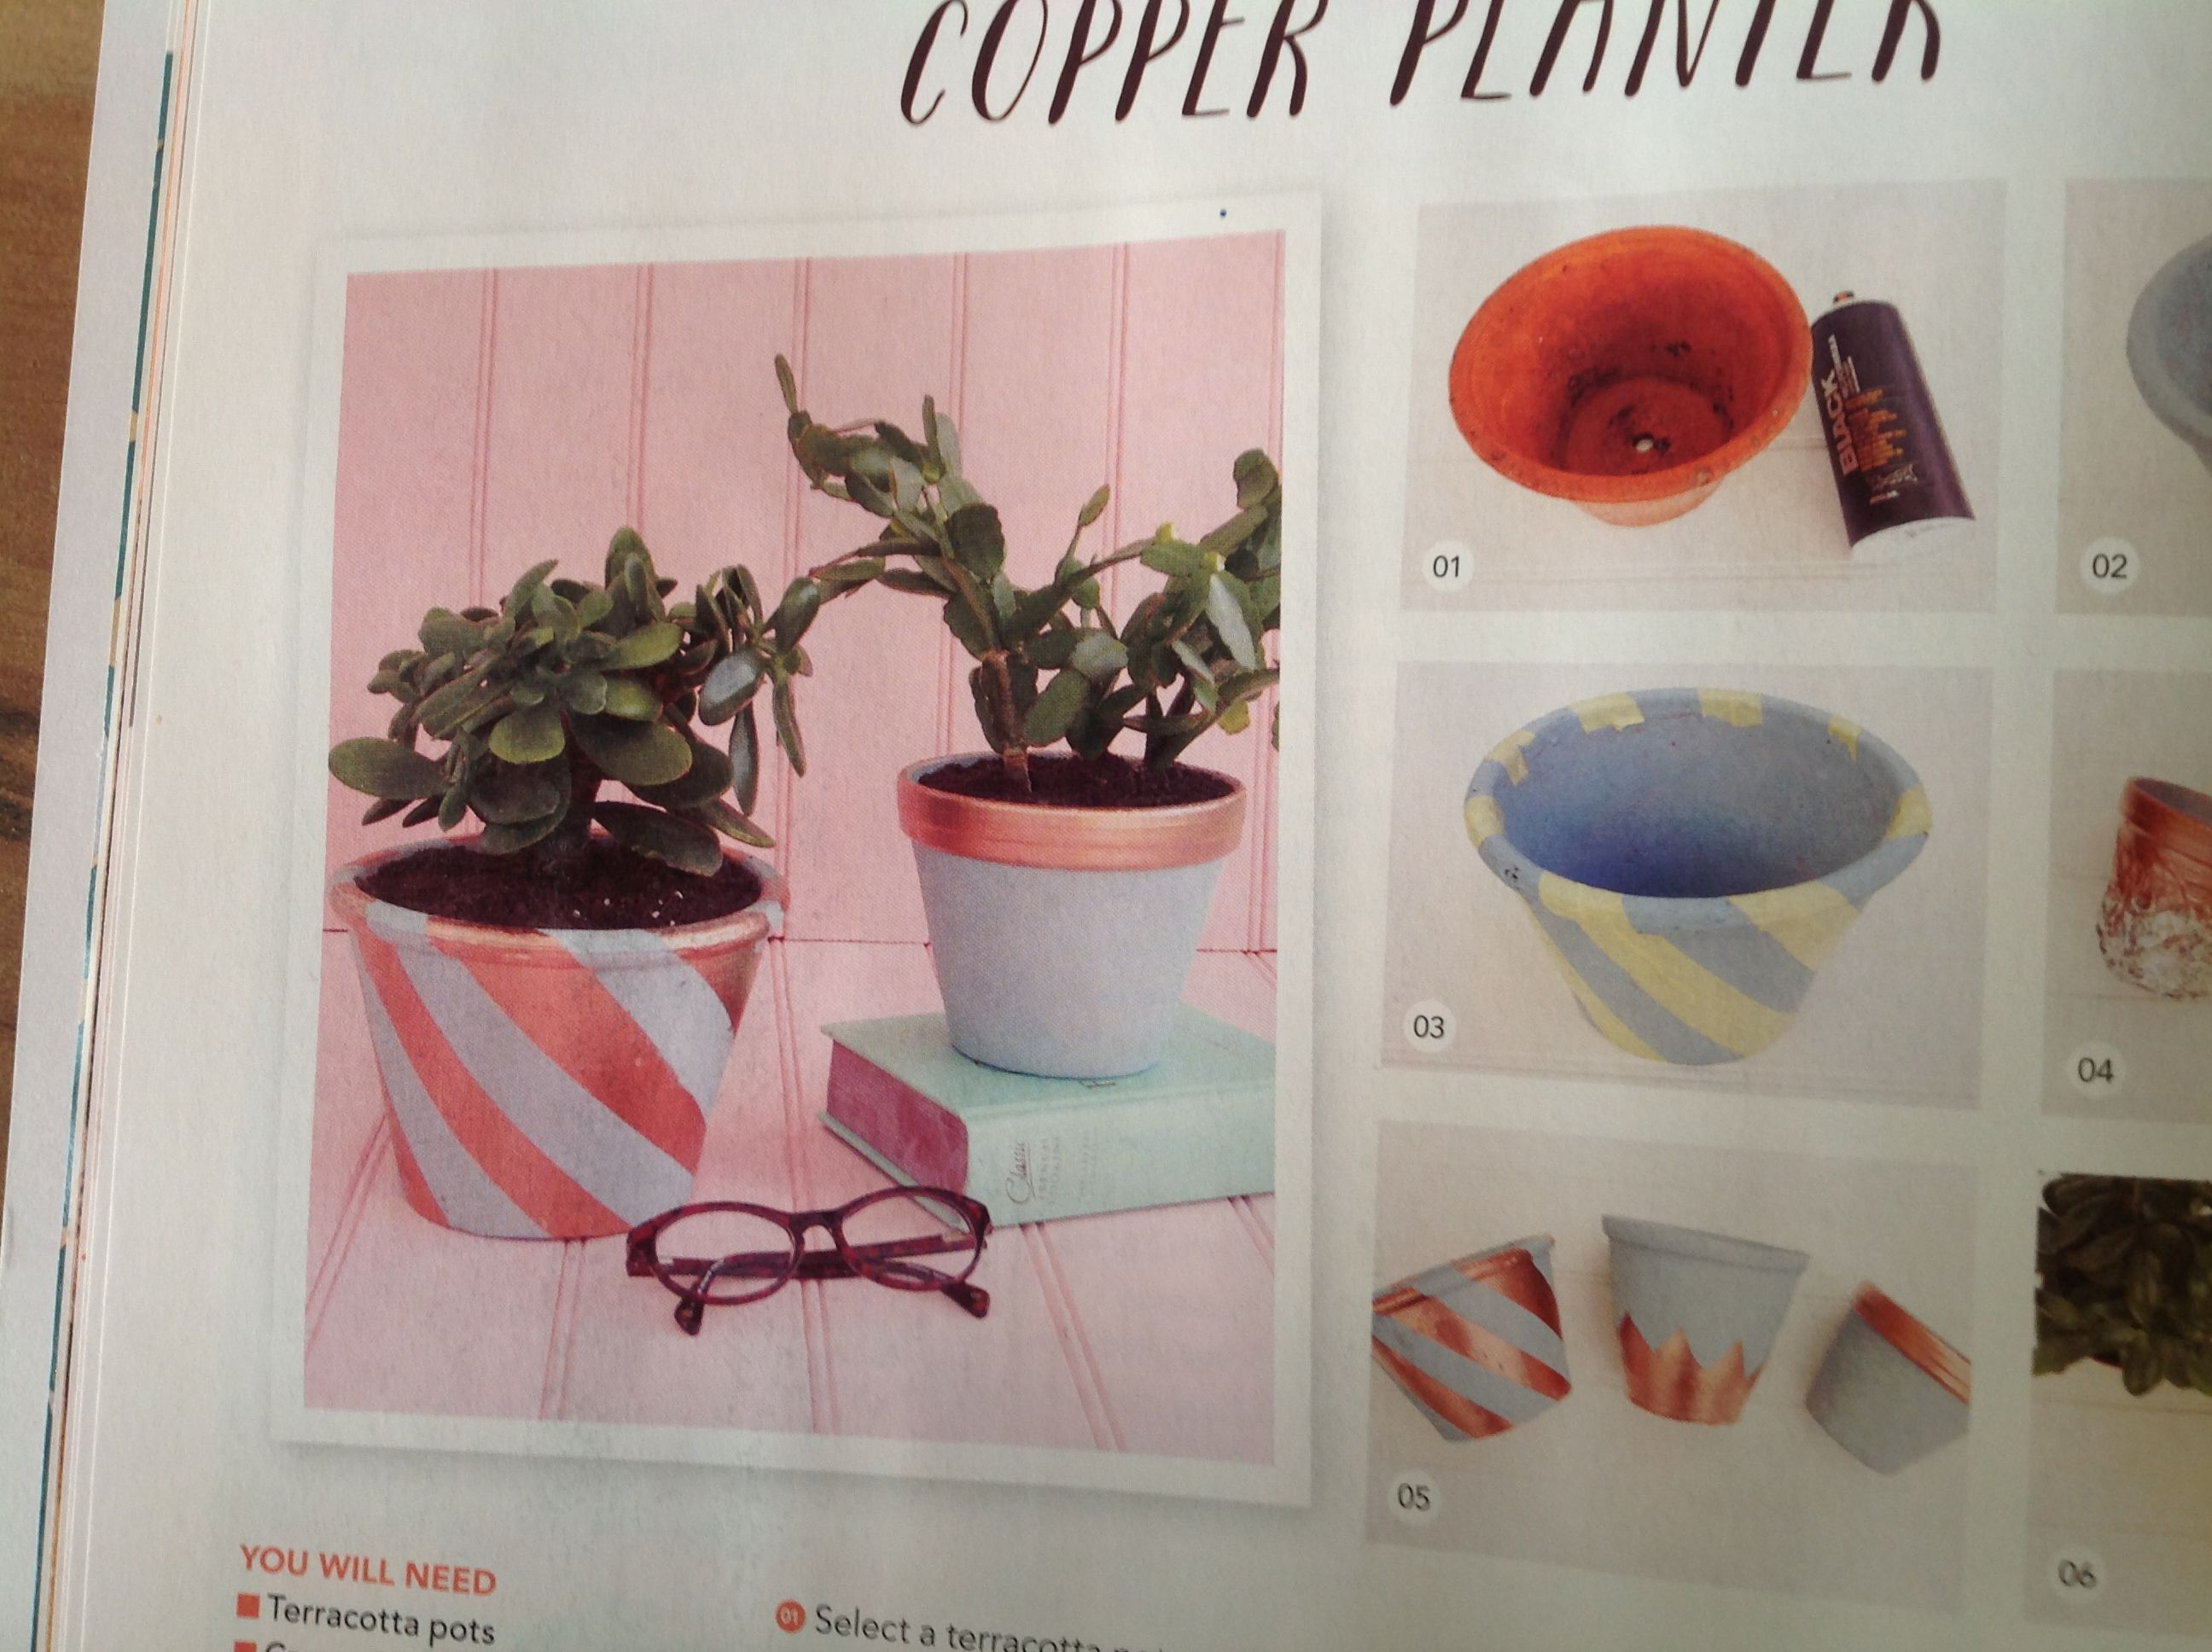 Copper planter | Mollie Makes Issue 47